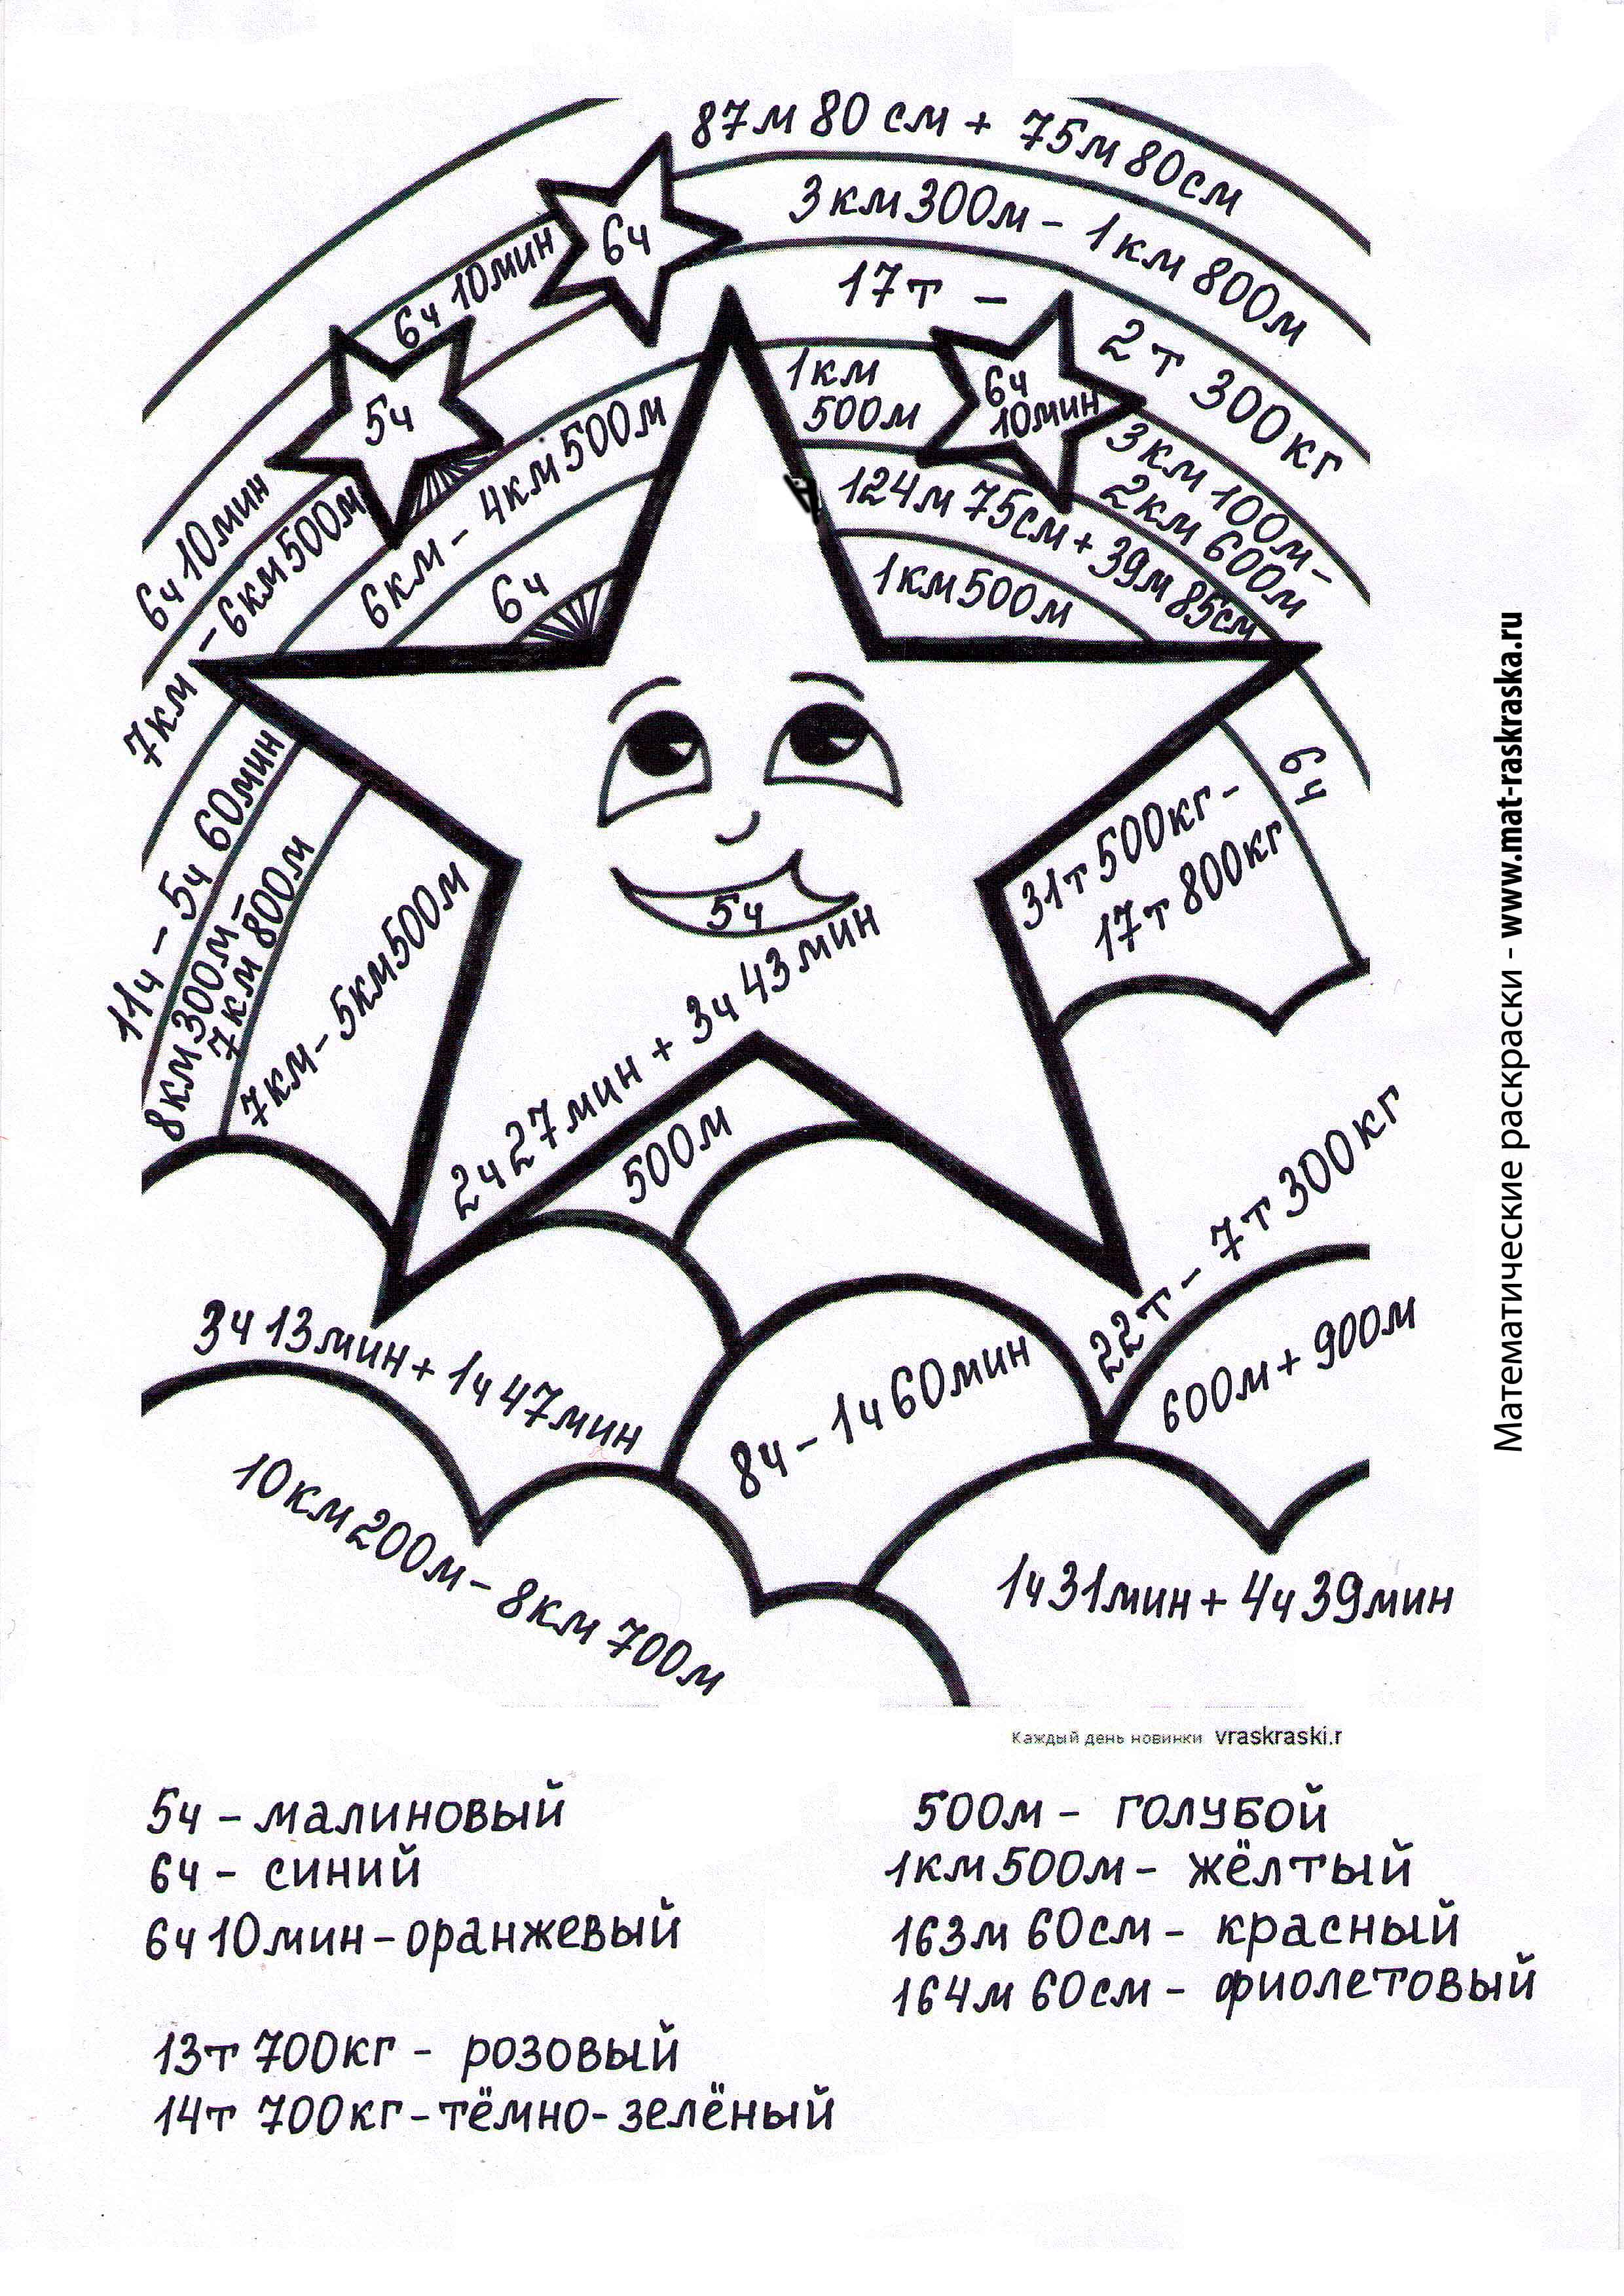 http://www.mat-raskraska.ru/images/stories/Raskraski/Deistvia-s-velichinami/zvezda-sloz-vich-velich-v1_big.jpg